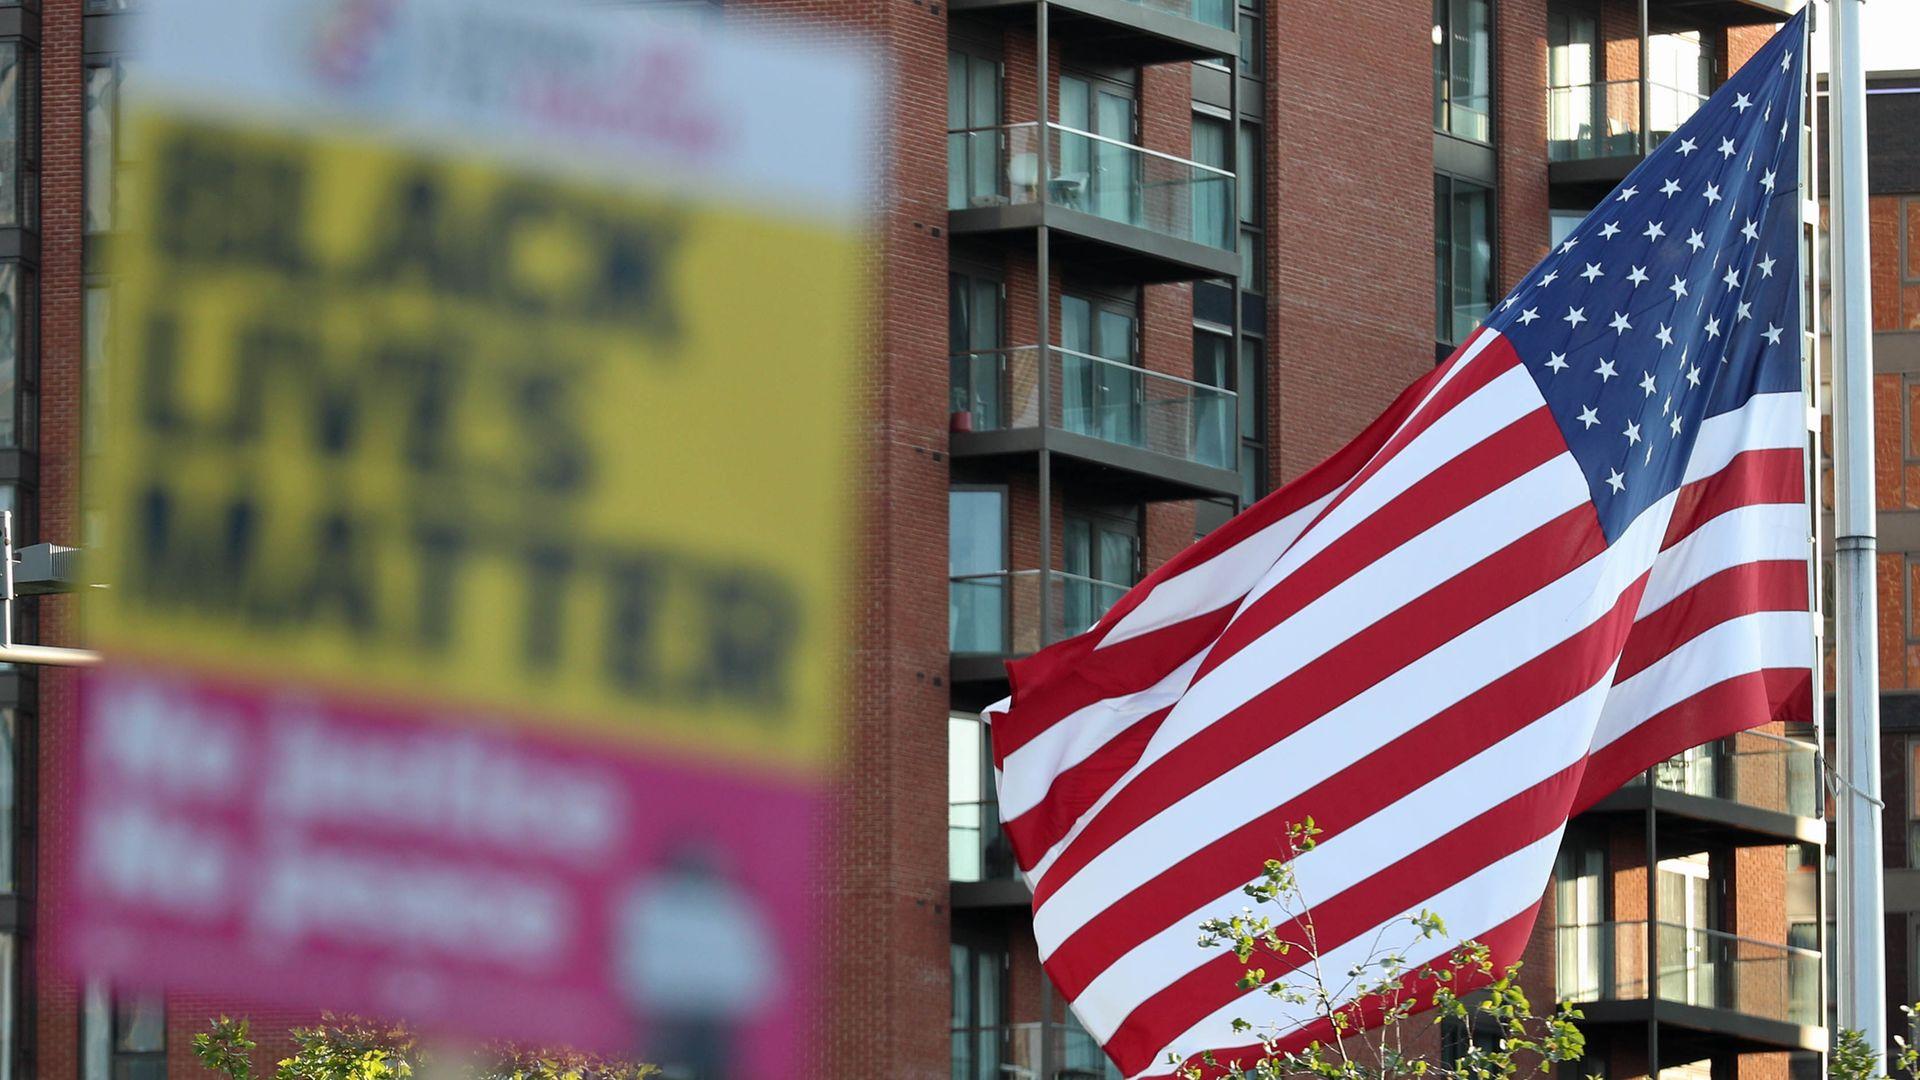 Black Lives Matter placard alongside the American flag - Credit: PA